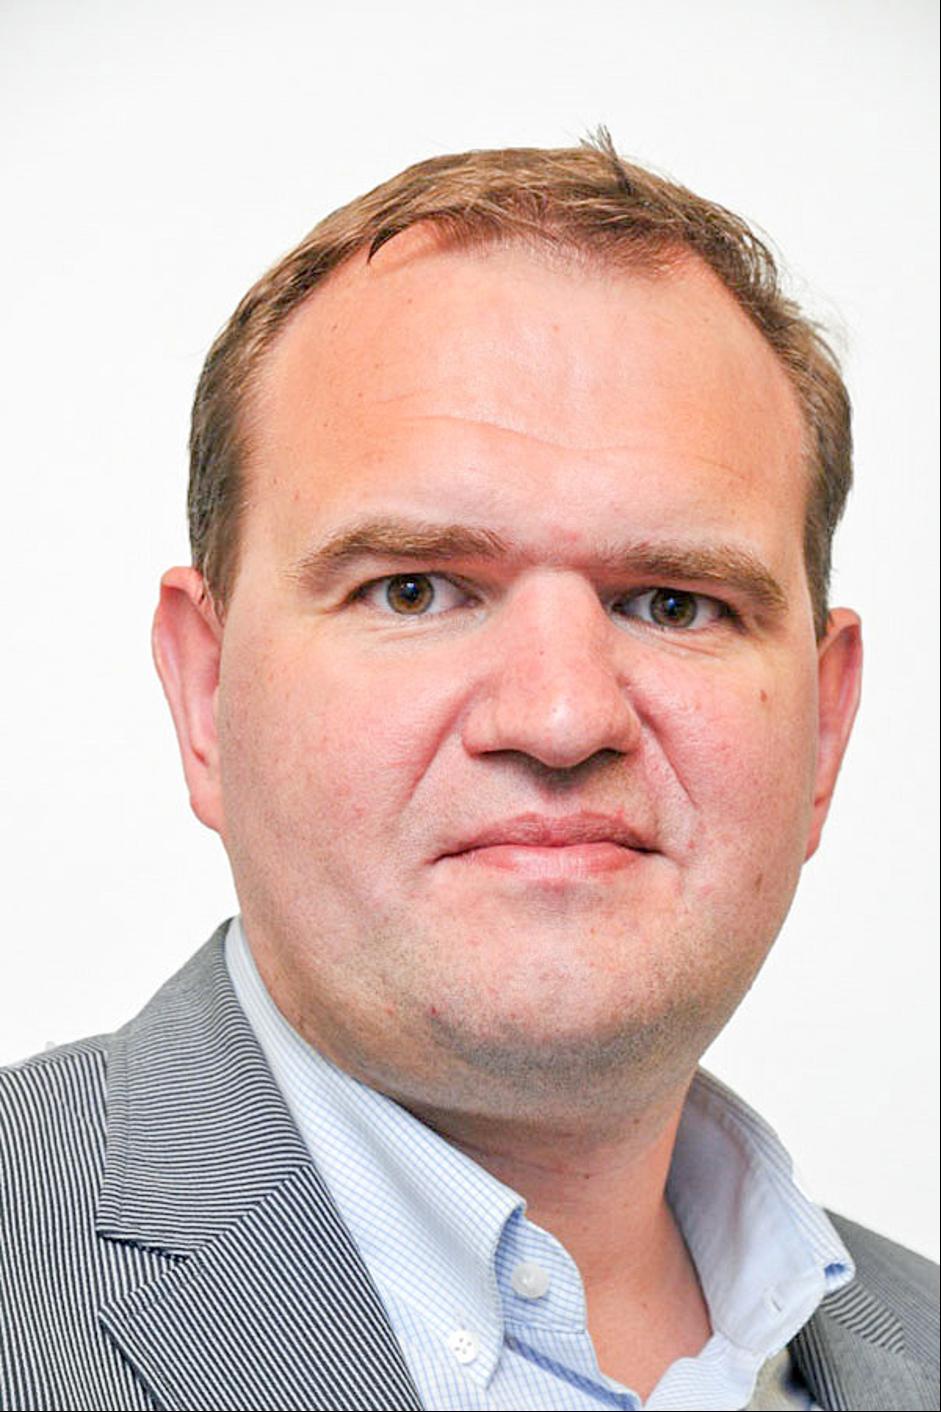 Dr. Bob Vermeulen